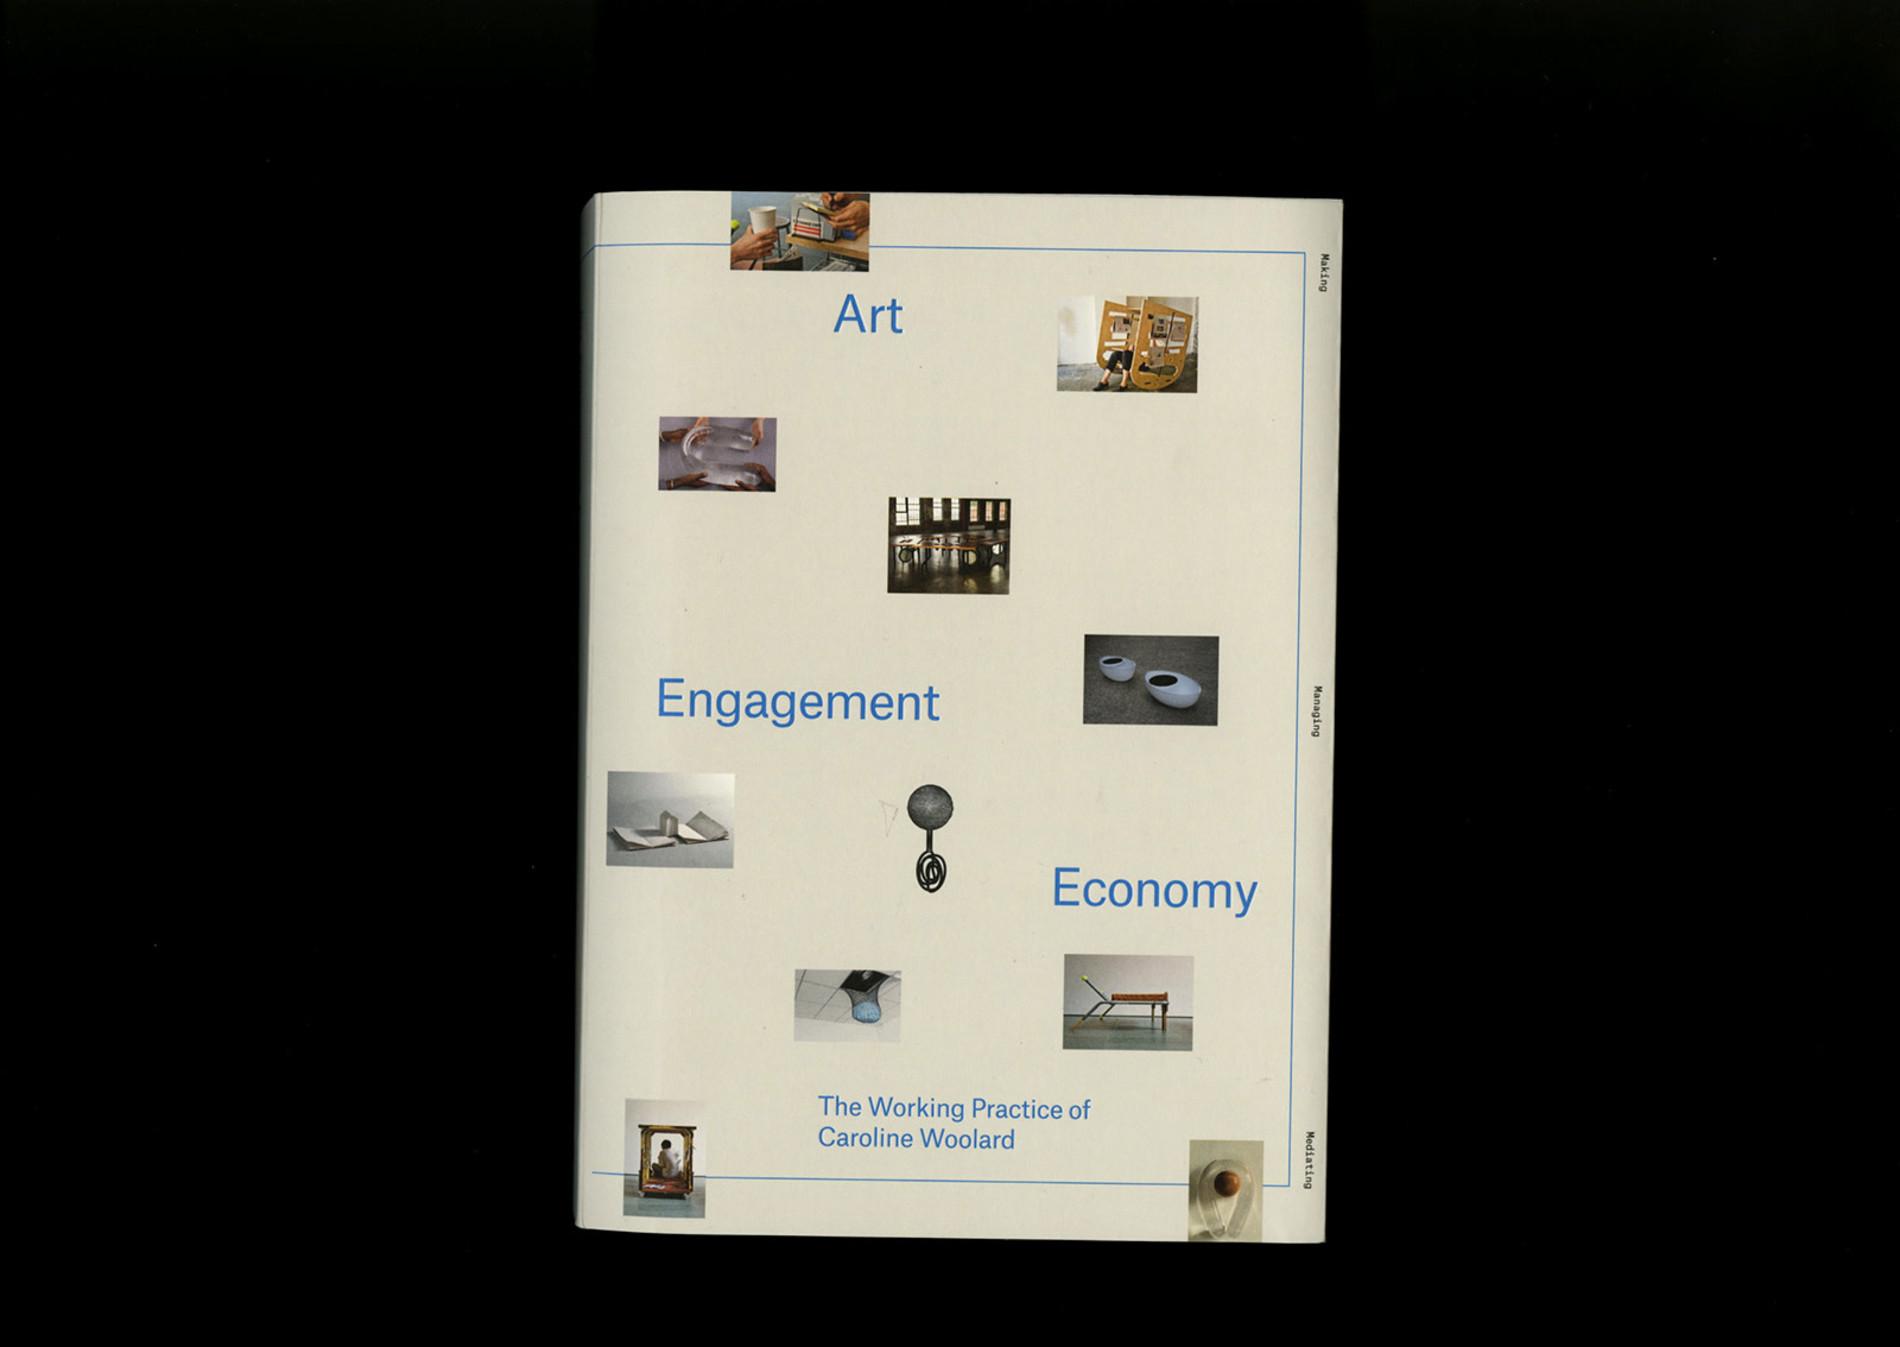 Onomatopee Projects Art, Engagement, Economy: The Working Practice of Caroline Woolard